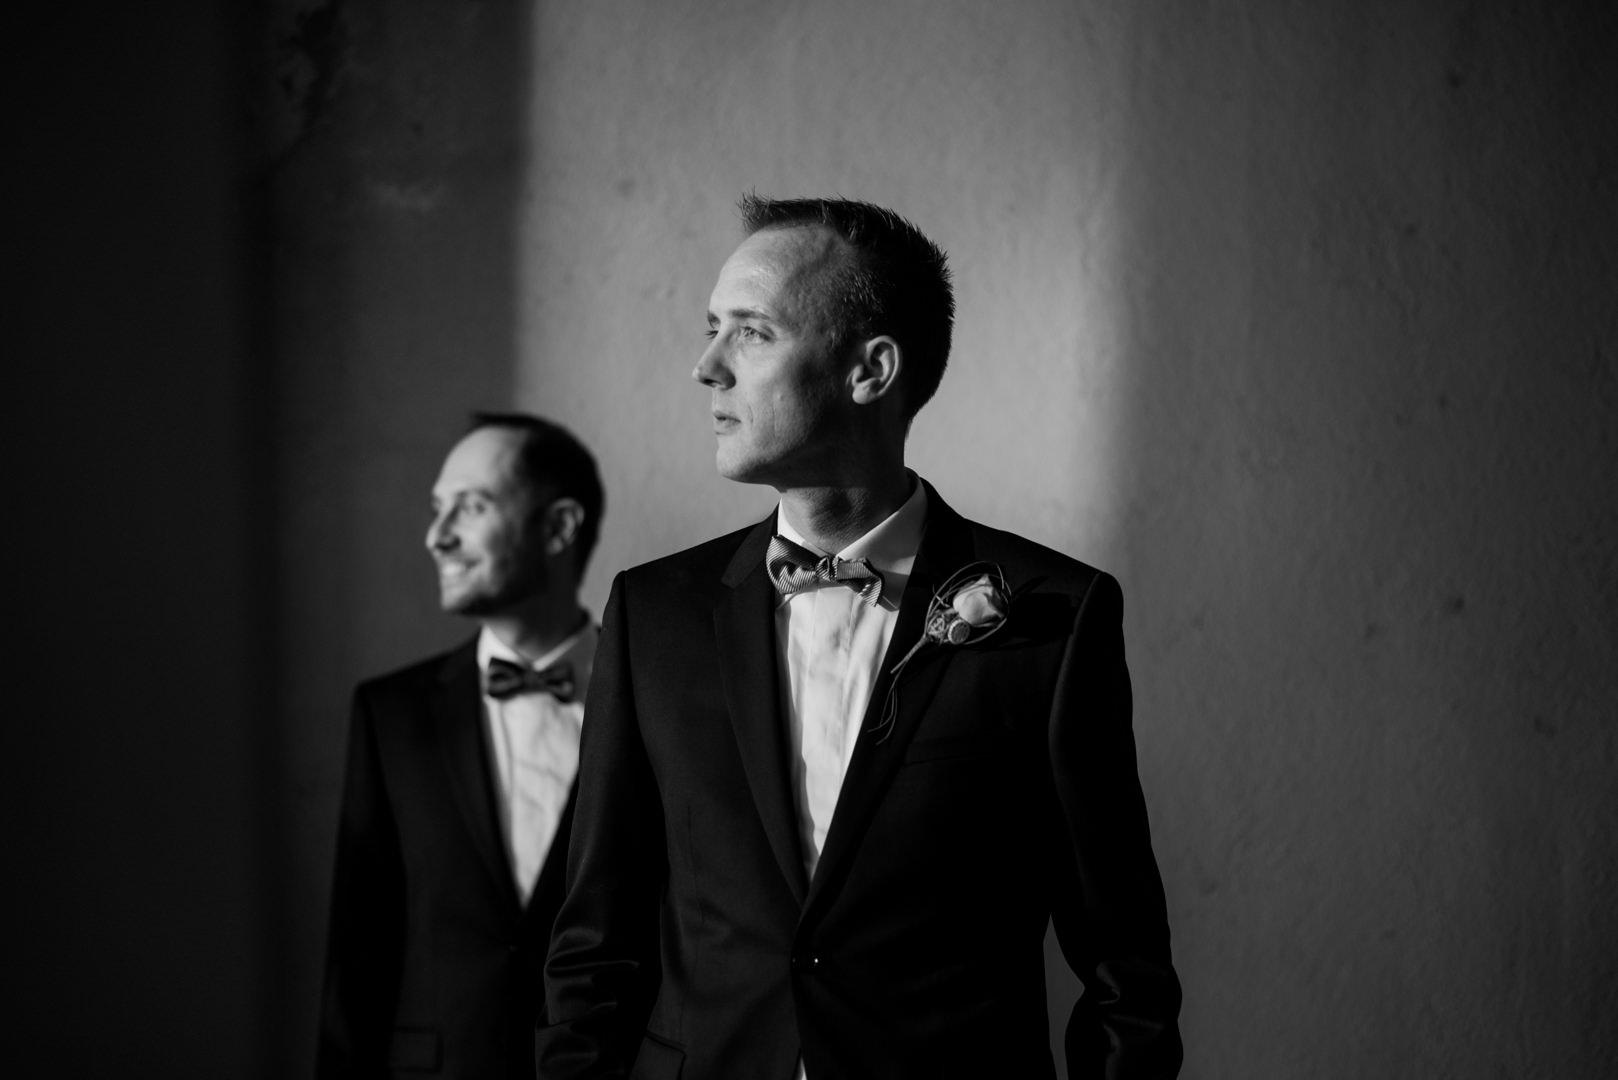 Same-sex-wedding-barcelona-boda- gay-samesex-engagement-Rafael-Torres-fotografo-bodas-sevilla-madrid-barcelona-wedding-photographer--30.jpg